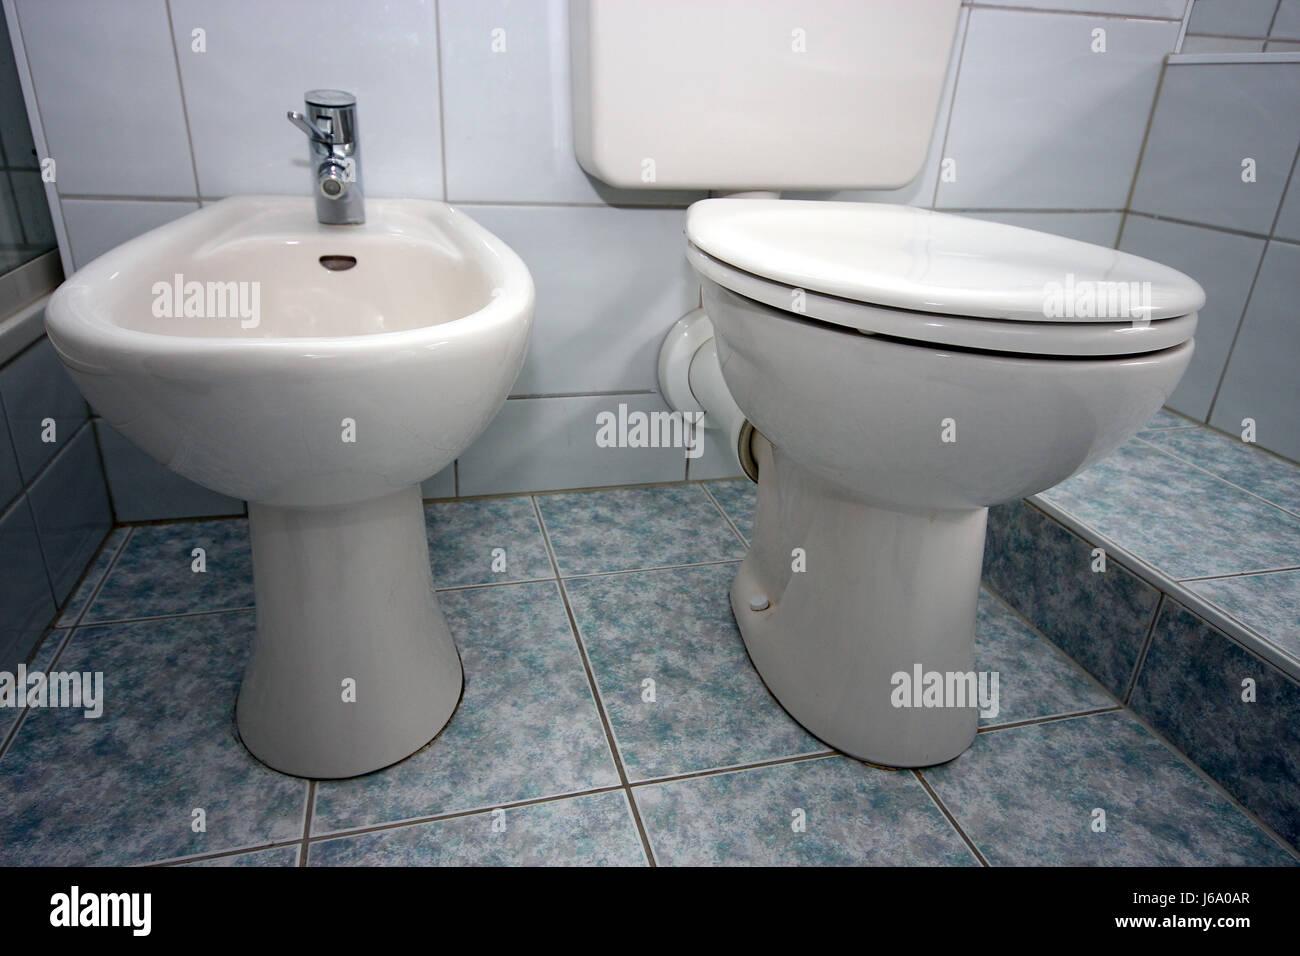 purify toilet personal care bidet bathroom flow purify ceramic tiles toilet Stock Photo